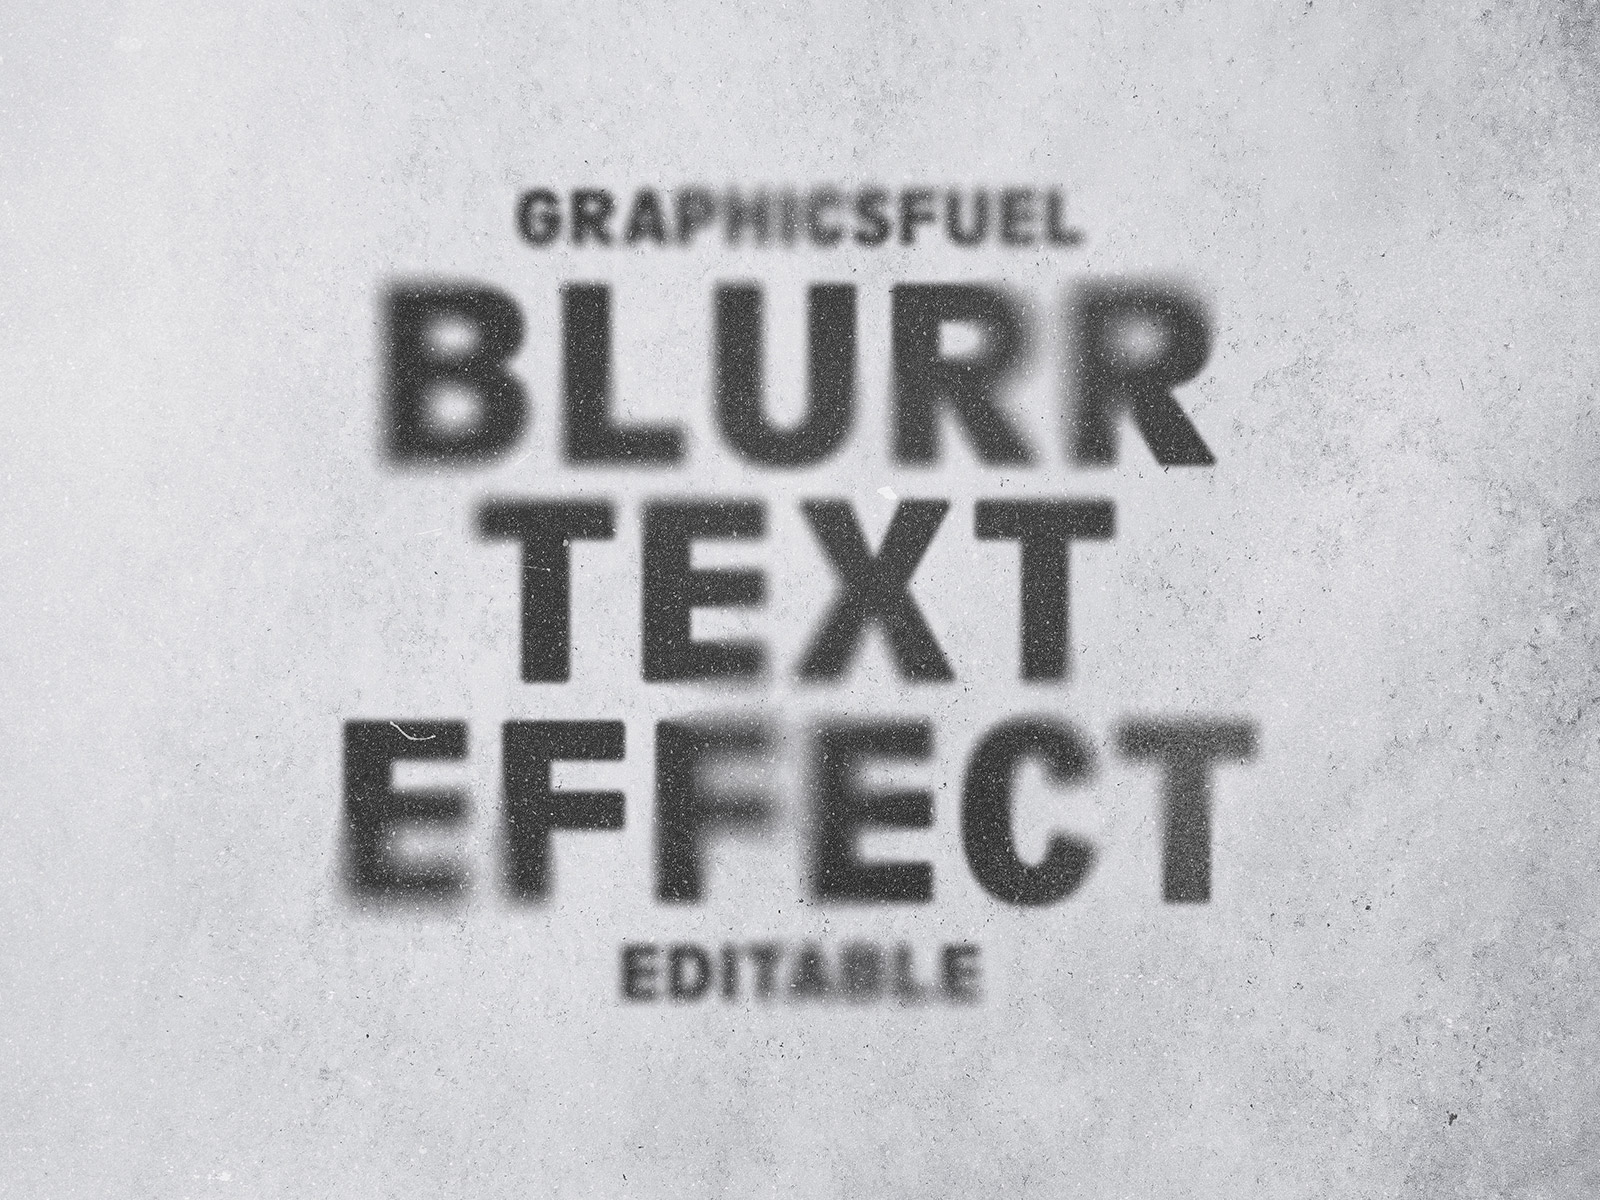 Ghost Blurr Text Effect